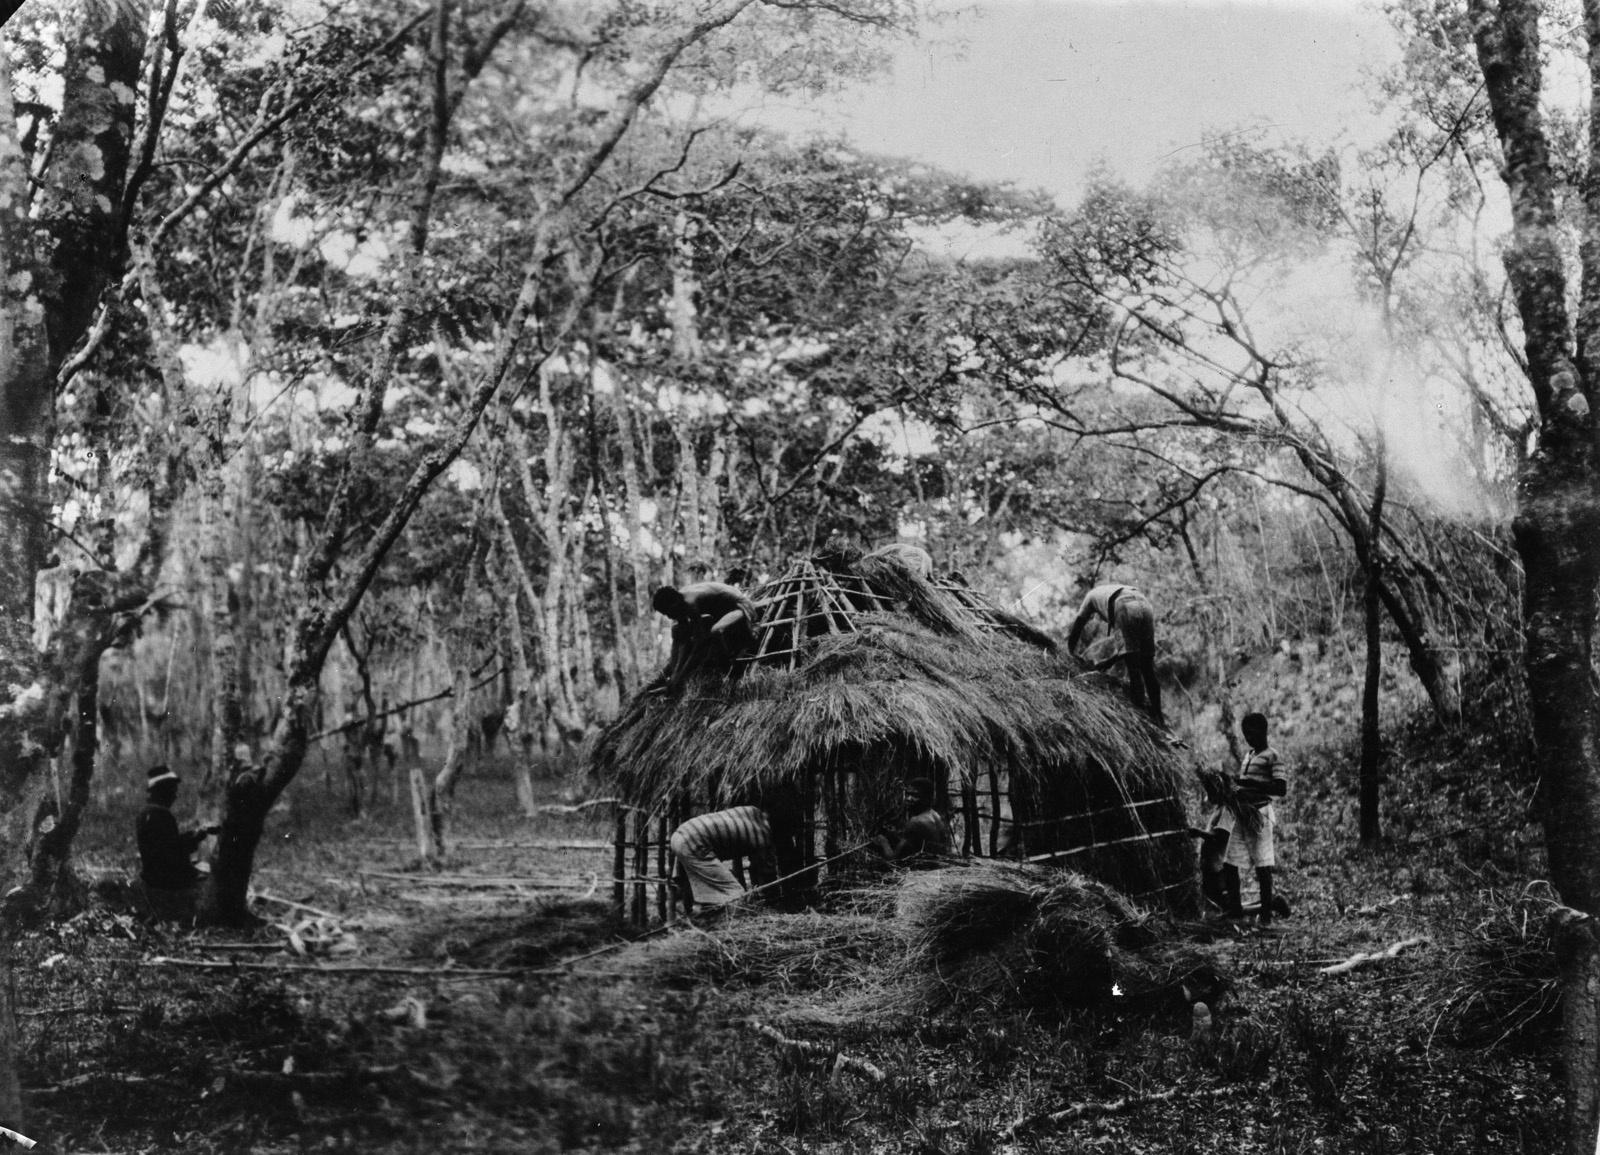 Н'Чанга. Строительство амбара в деревне банту